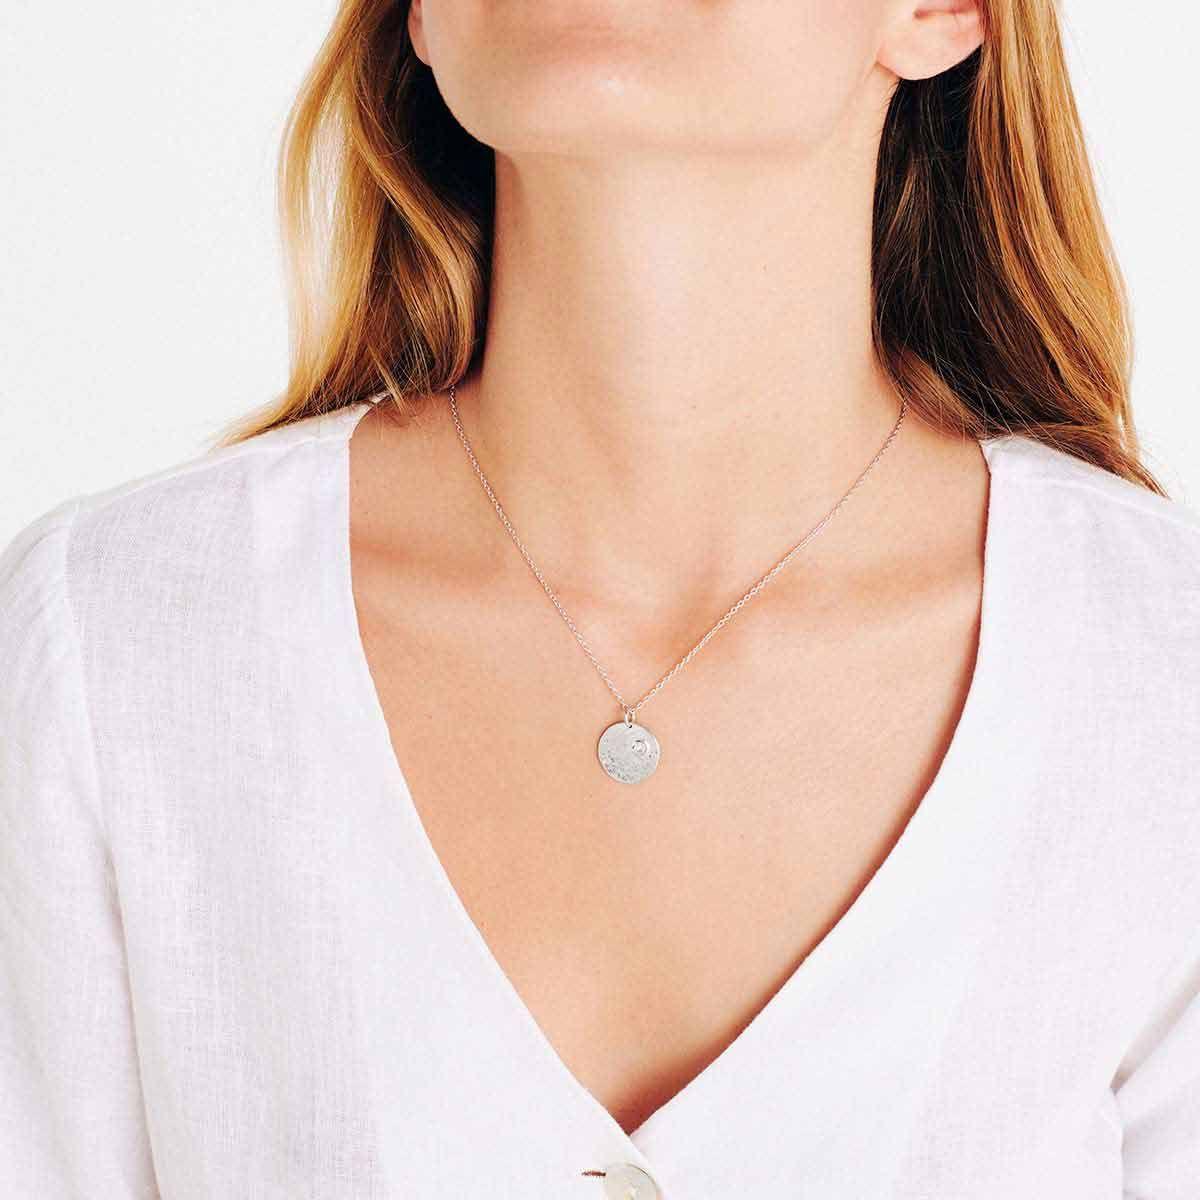 Birthstone April - Halsketten - 18k vergoldet